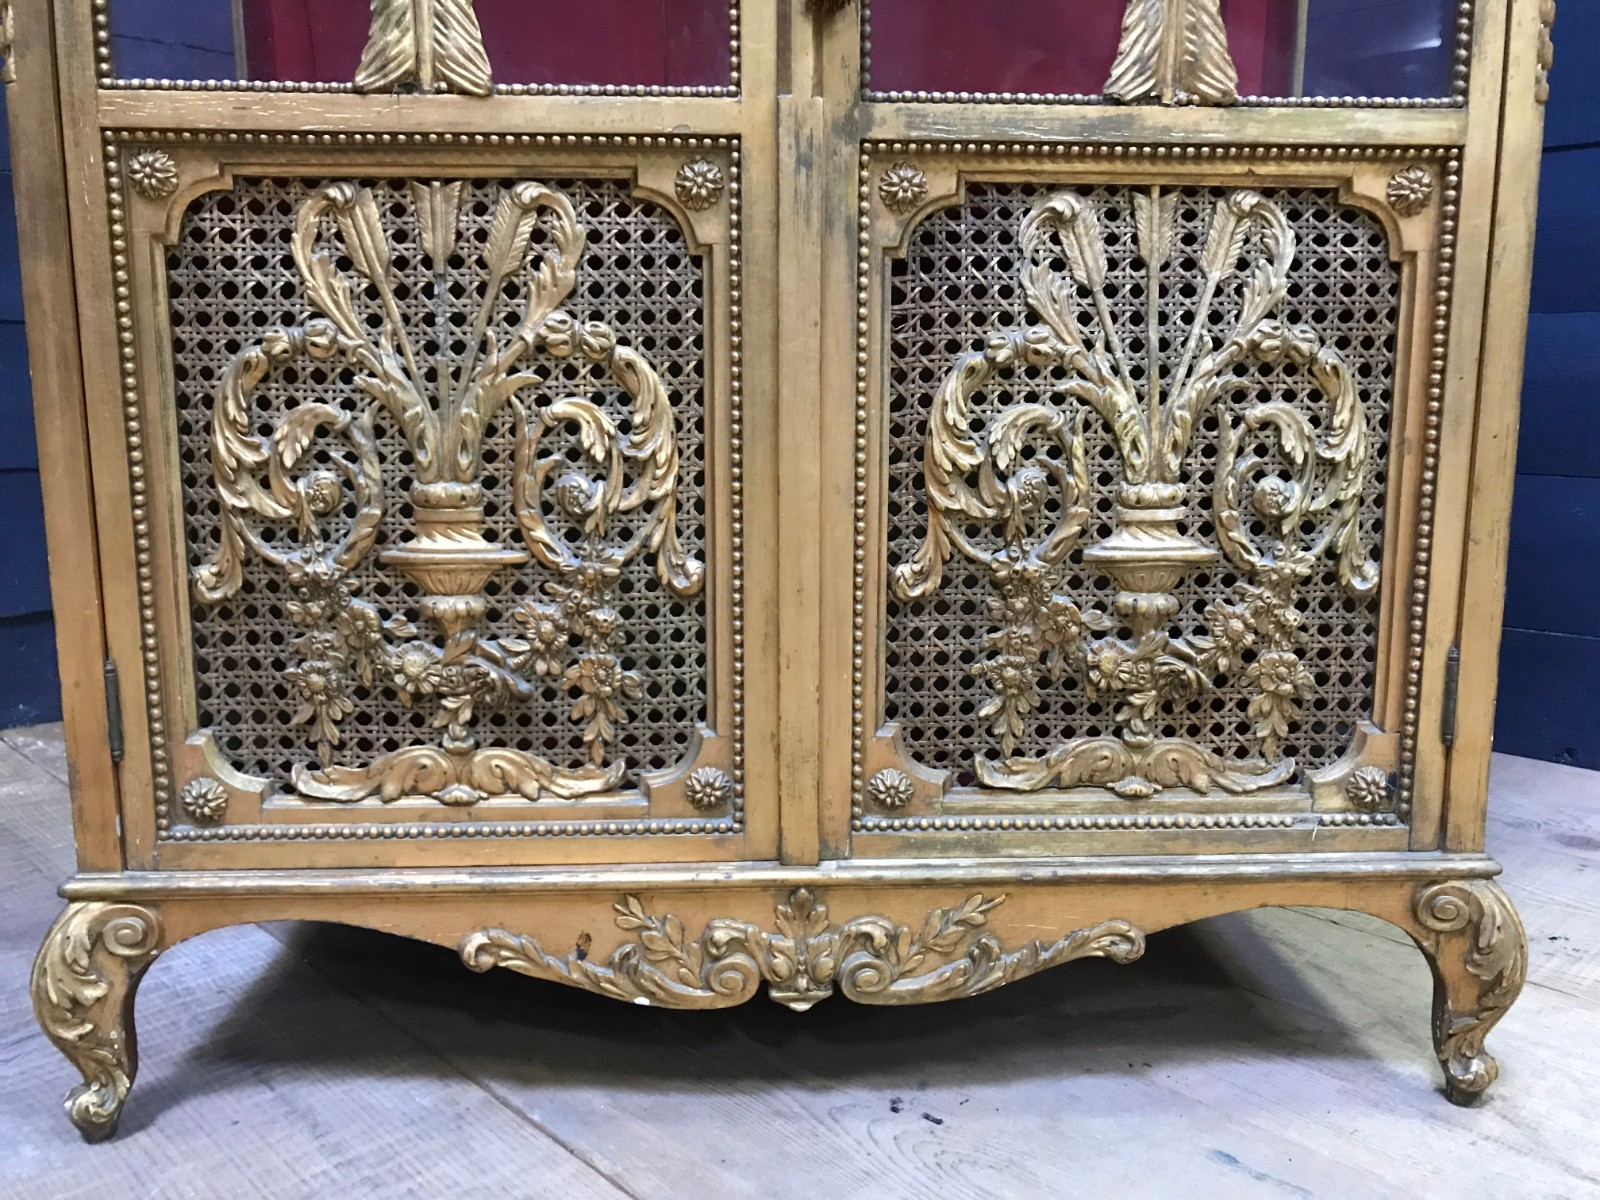 French Gilt Louis XVI Display Cabinet   Display Cabinets   FURNITURE    Antiques U0026 Furniture